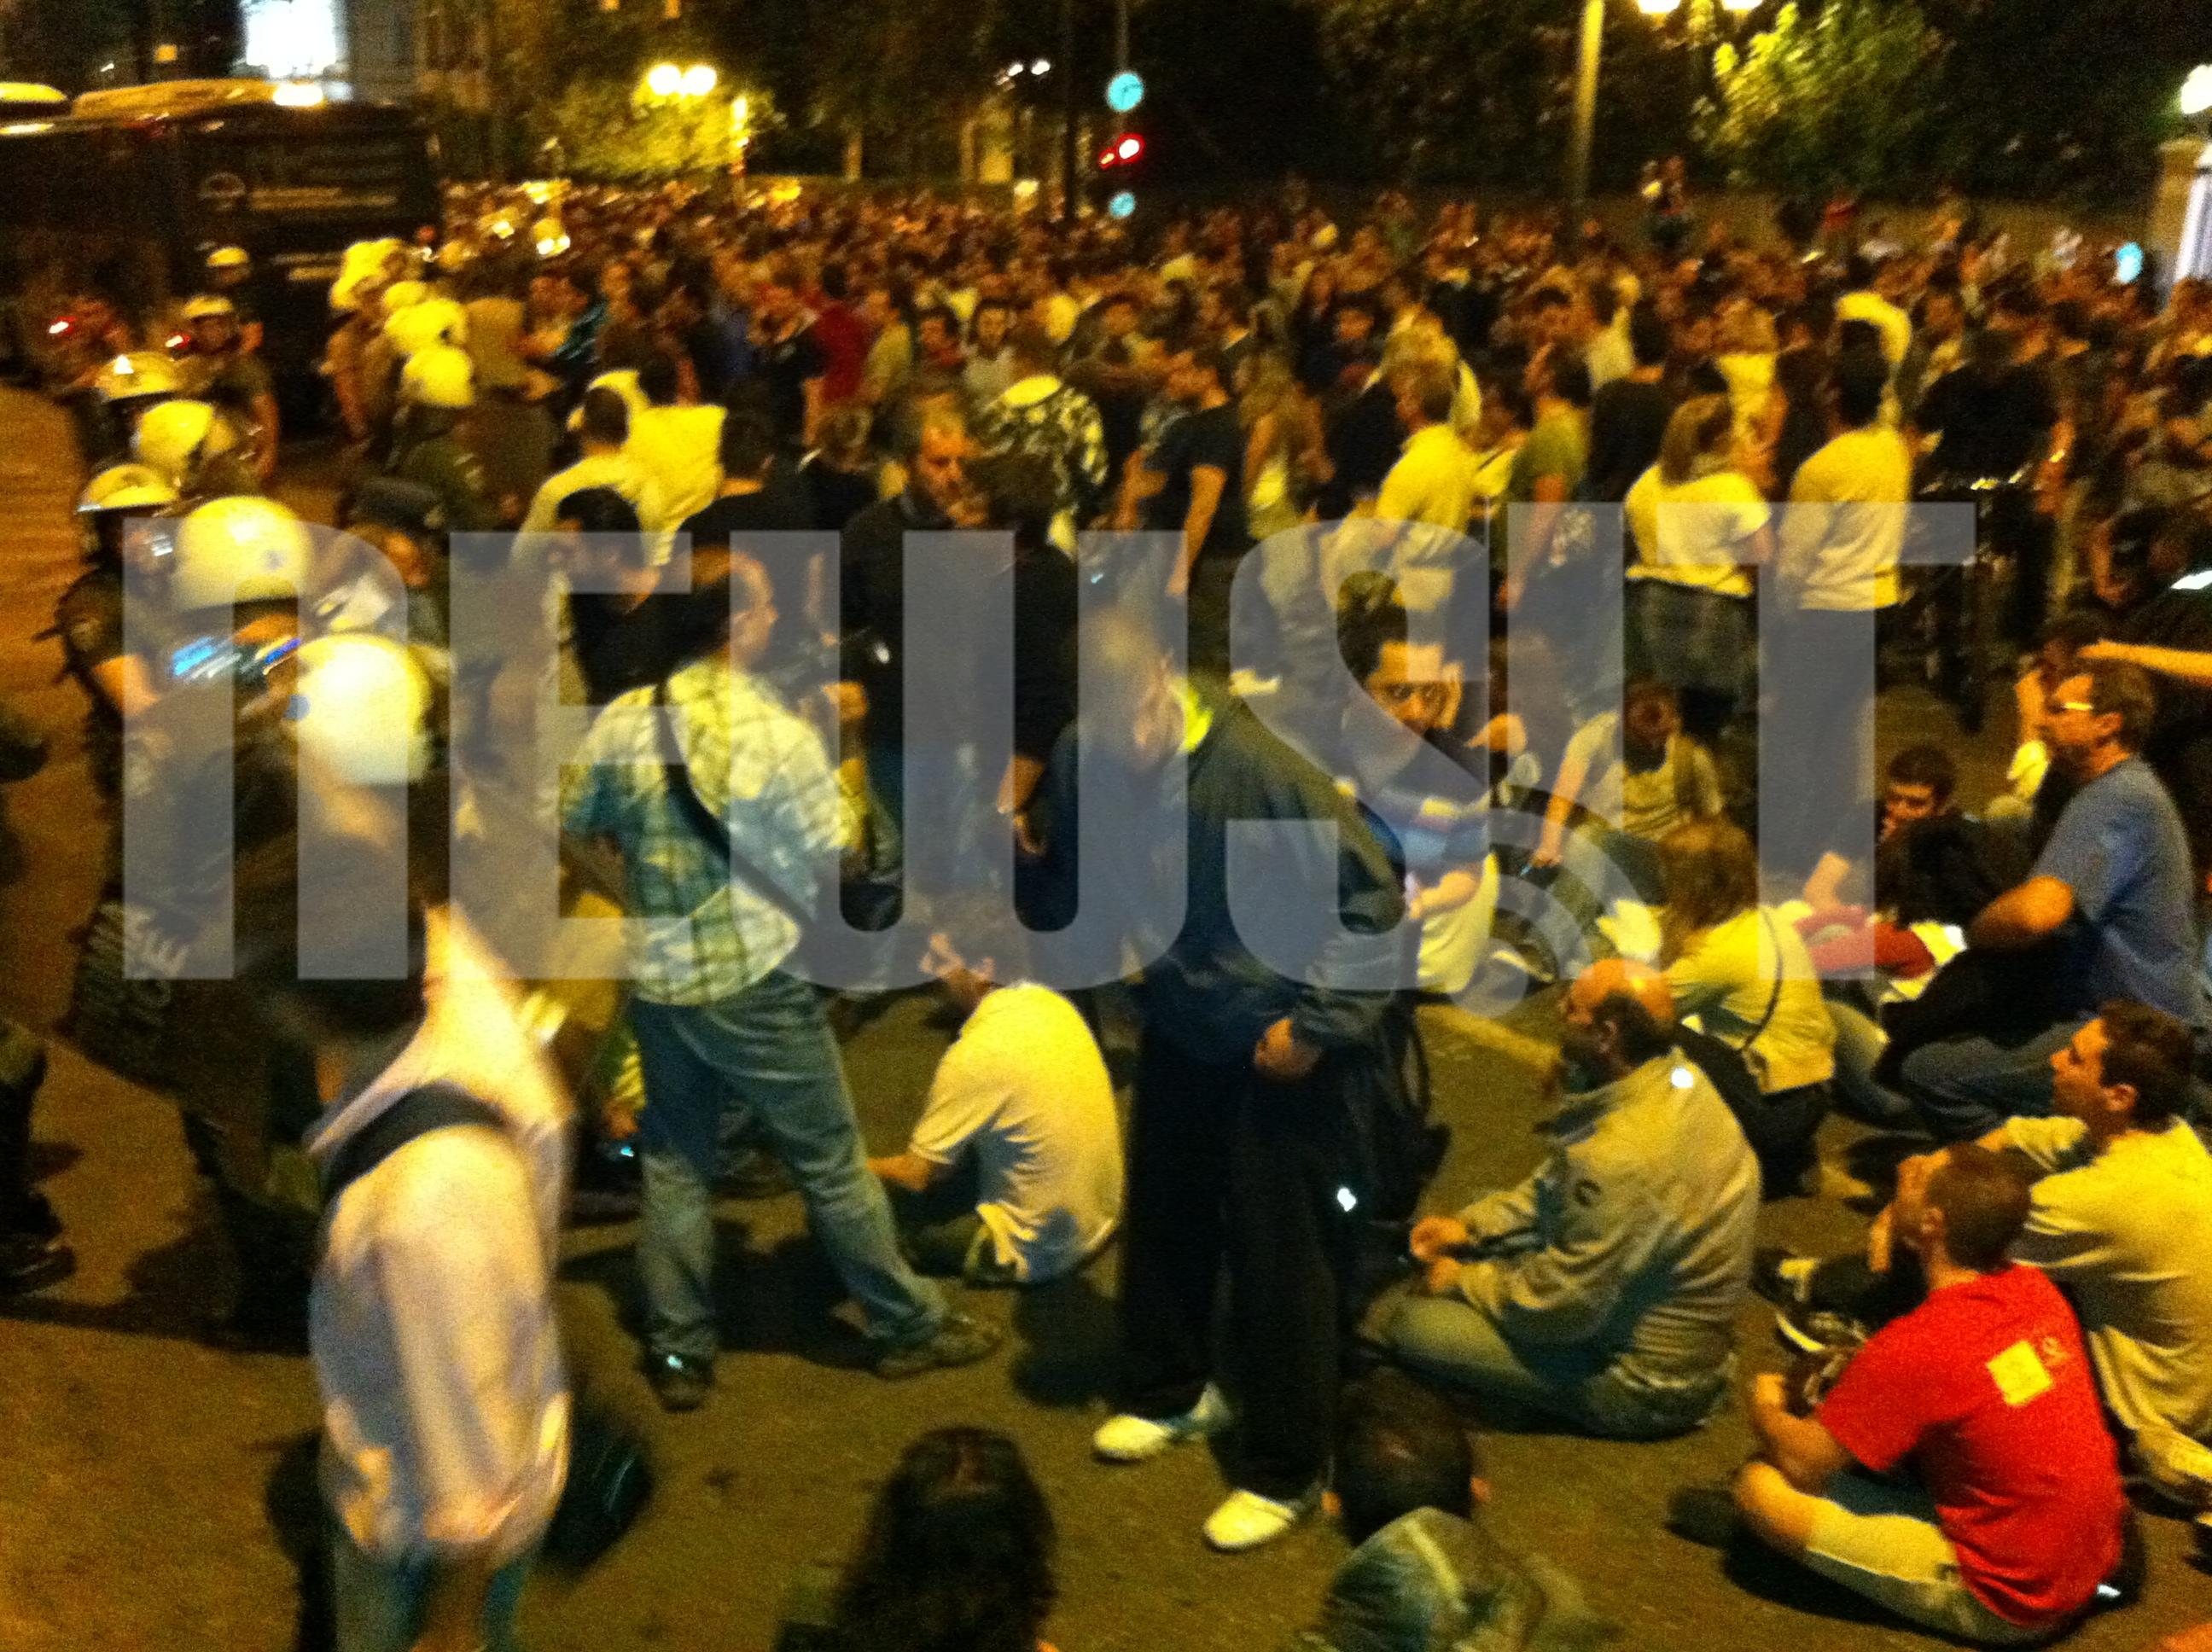 Oι διαδηλωτές στη Βασιλίσσης Σοφίας έχουν κλείσει την είσοδο της Βουλής